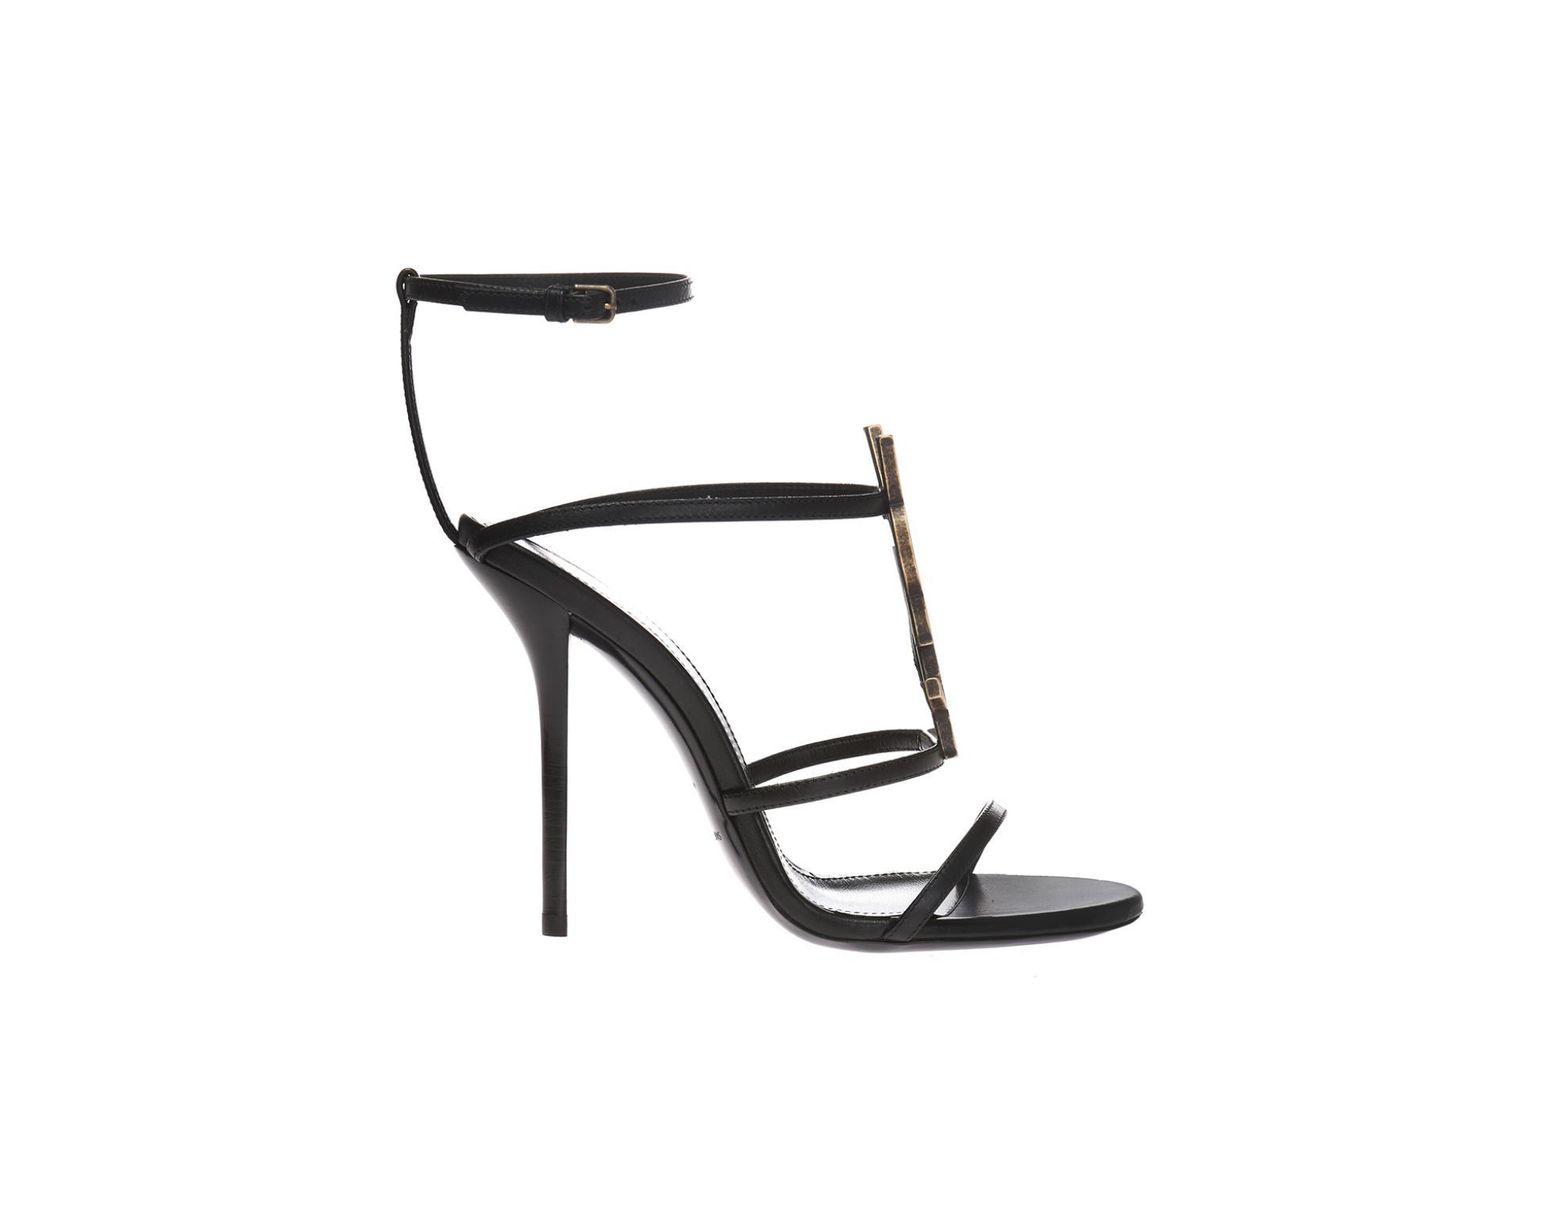 d7cbe66fa1 Women's Black 'cassandra' Stiletto Sandals